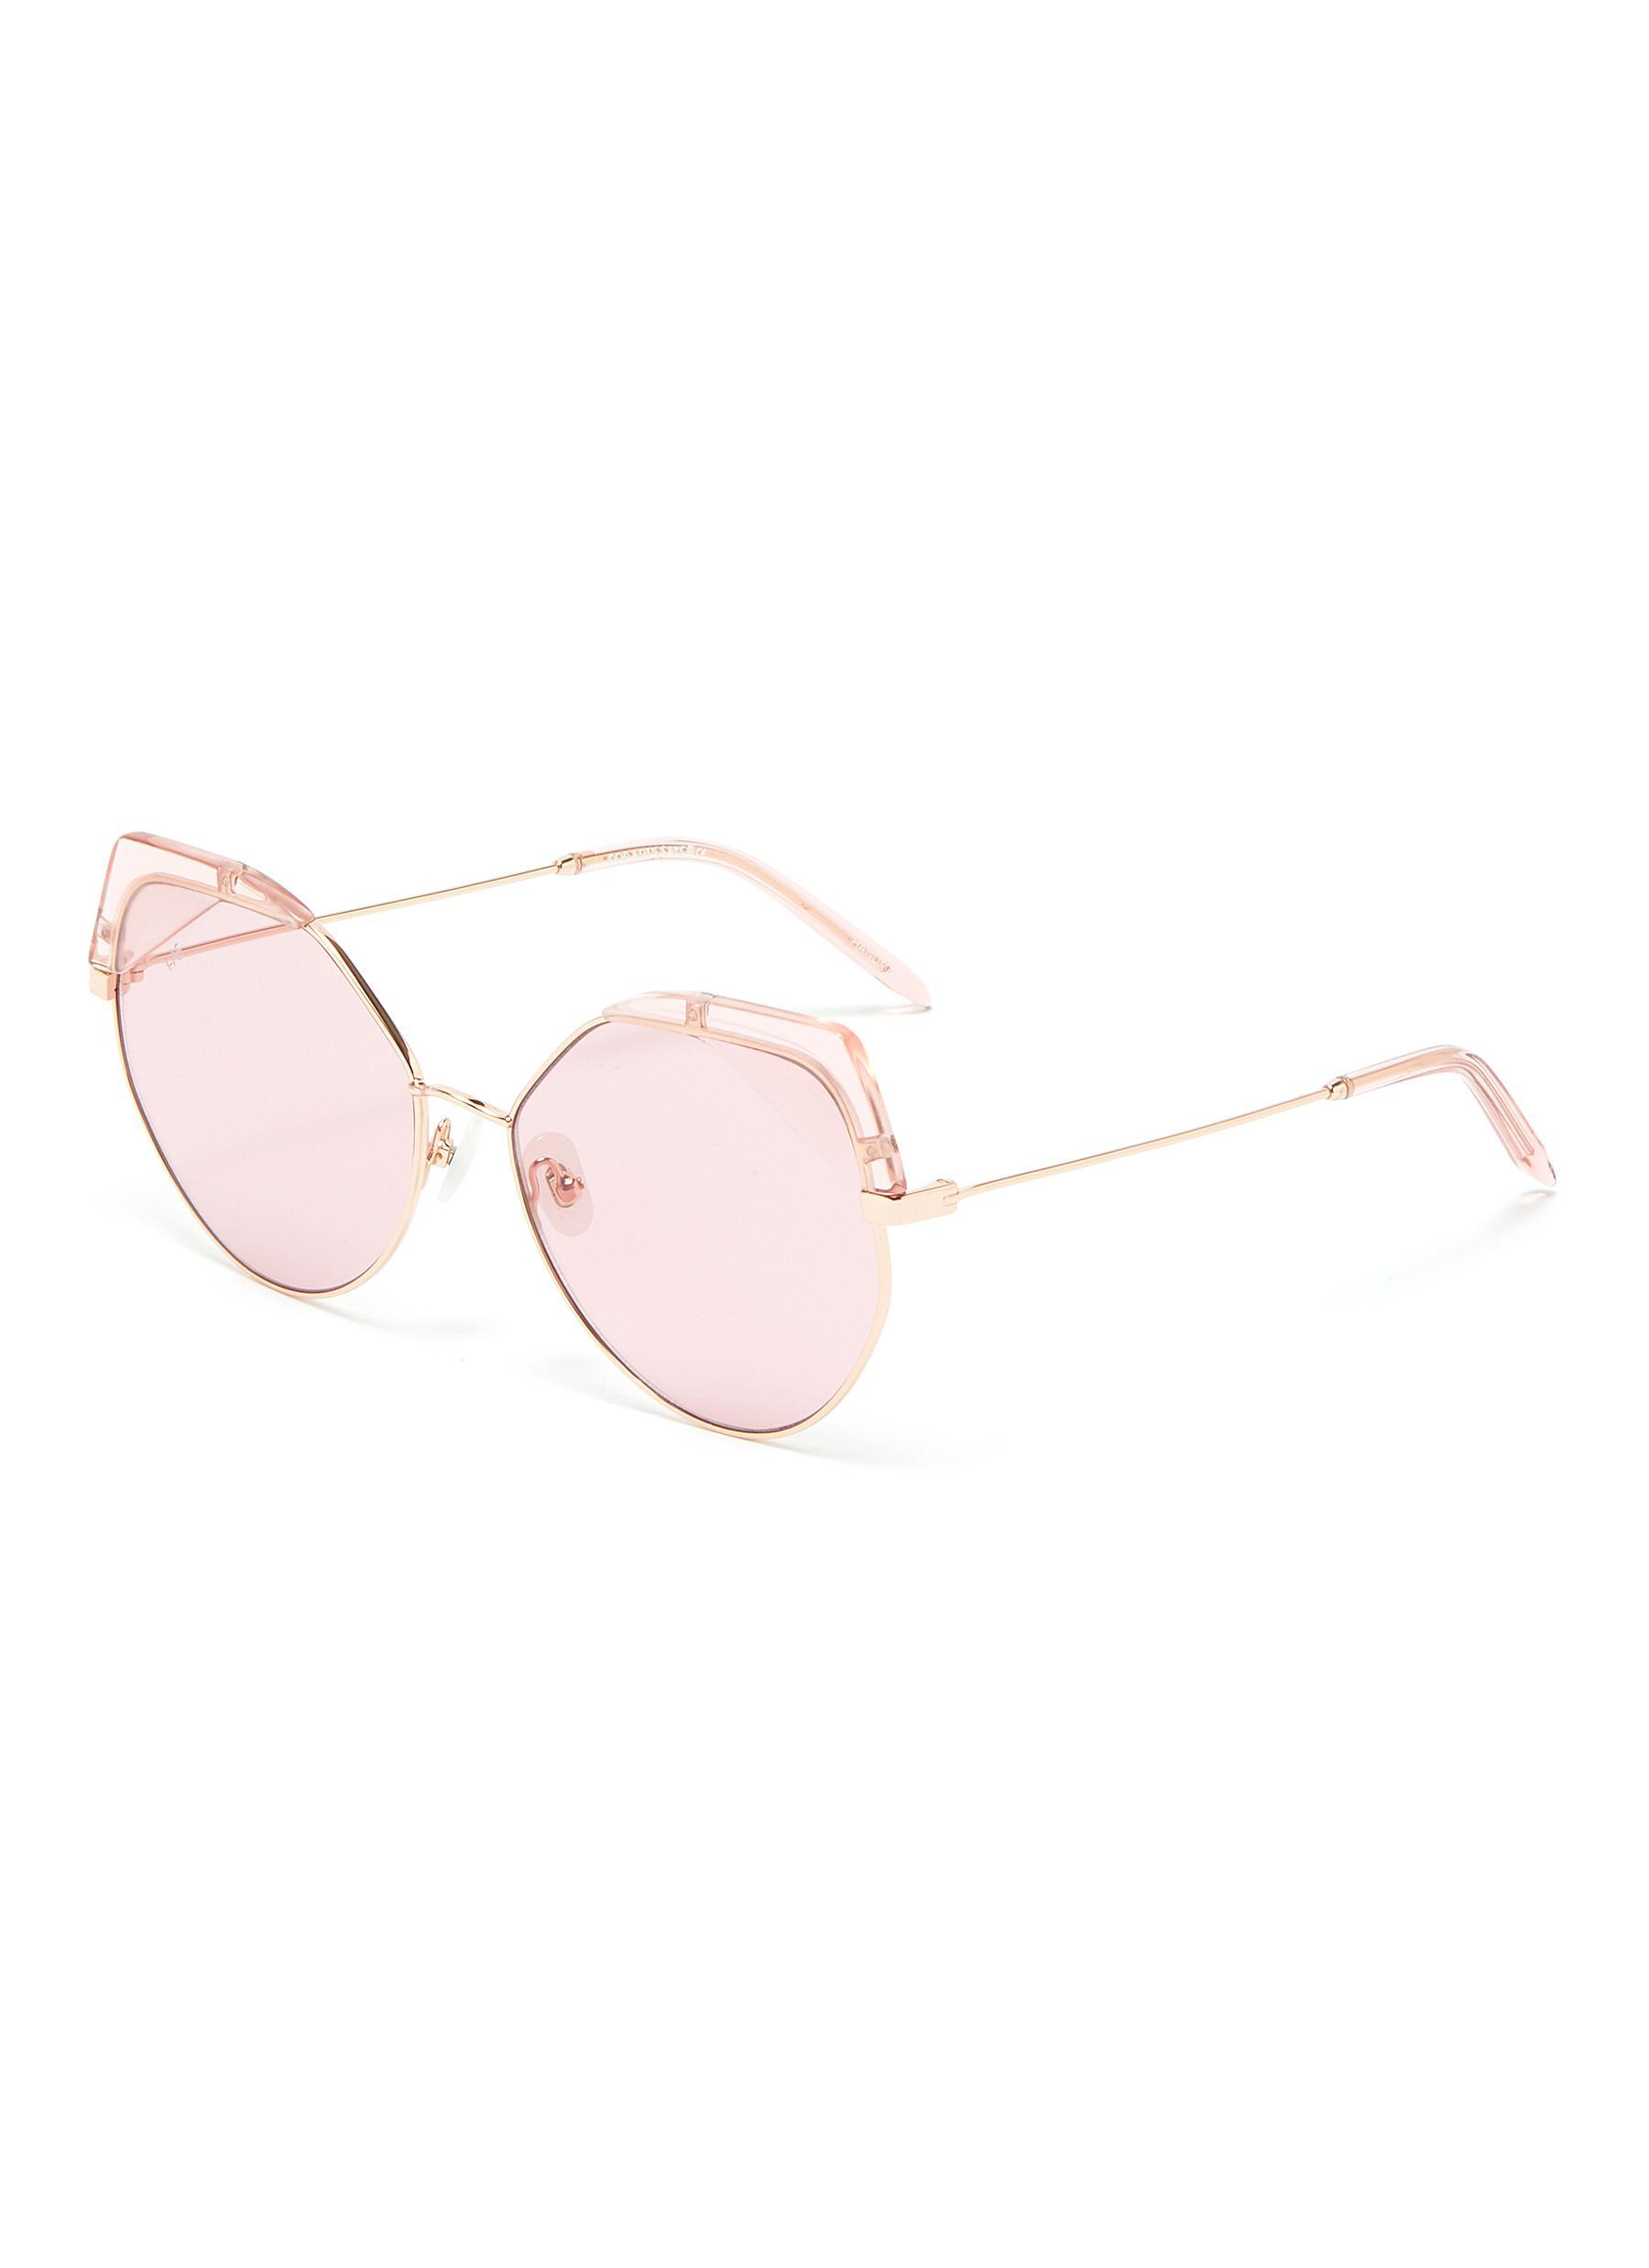 1efd6b7ae4 For Art s Sake.  Fruity  acetate corner metal cat eye sunglasses